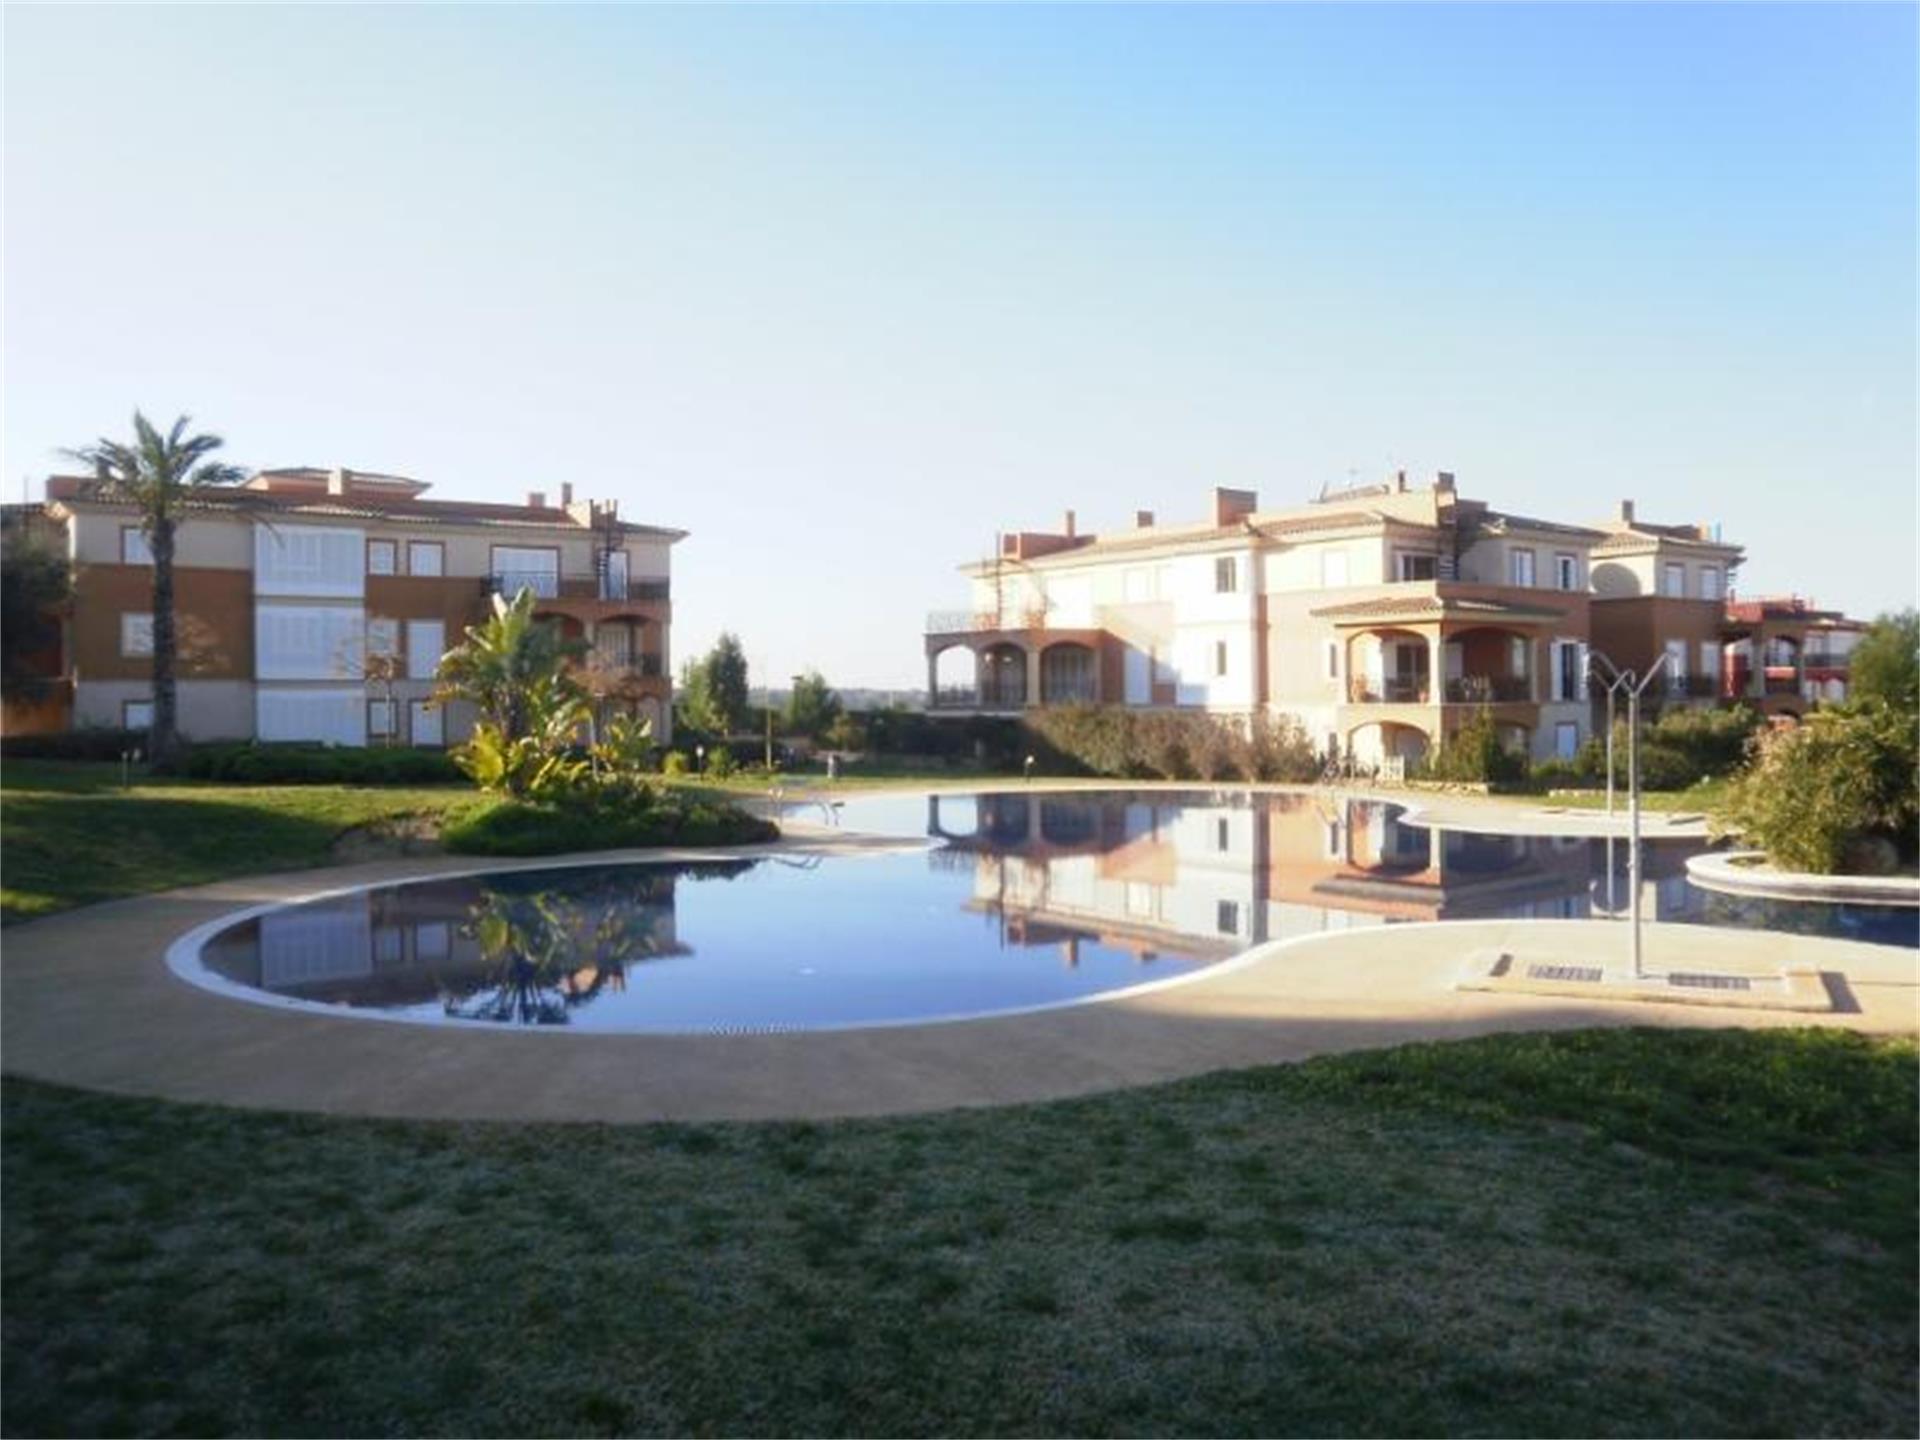 Flat for sale in Sant Jordi - Son Ferriol